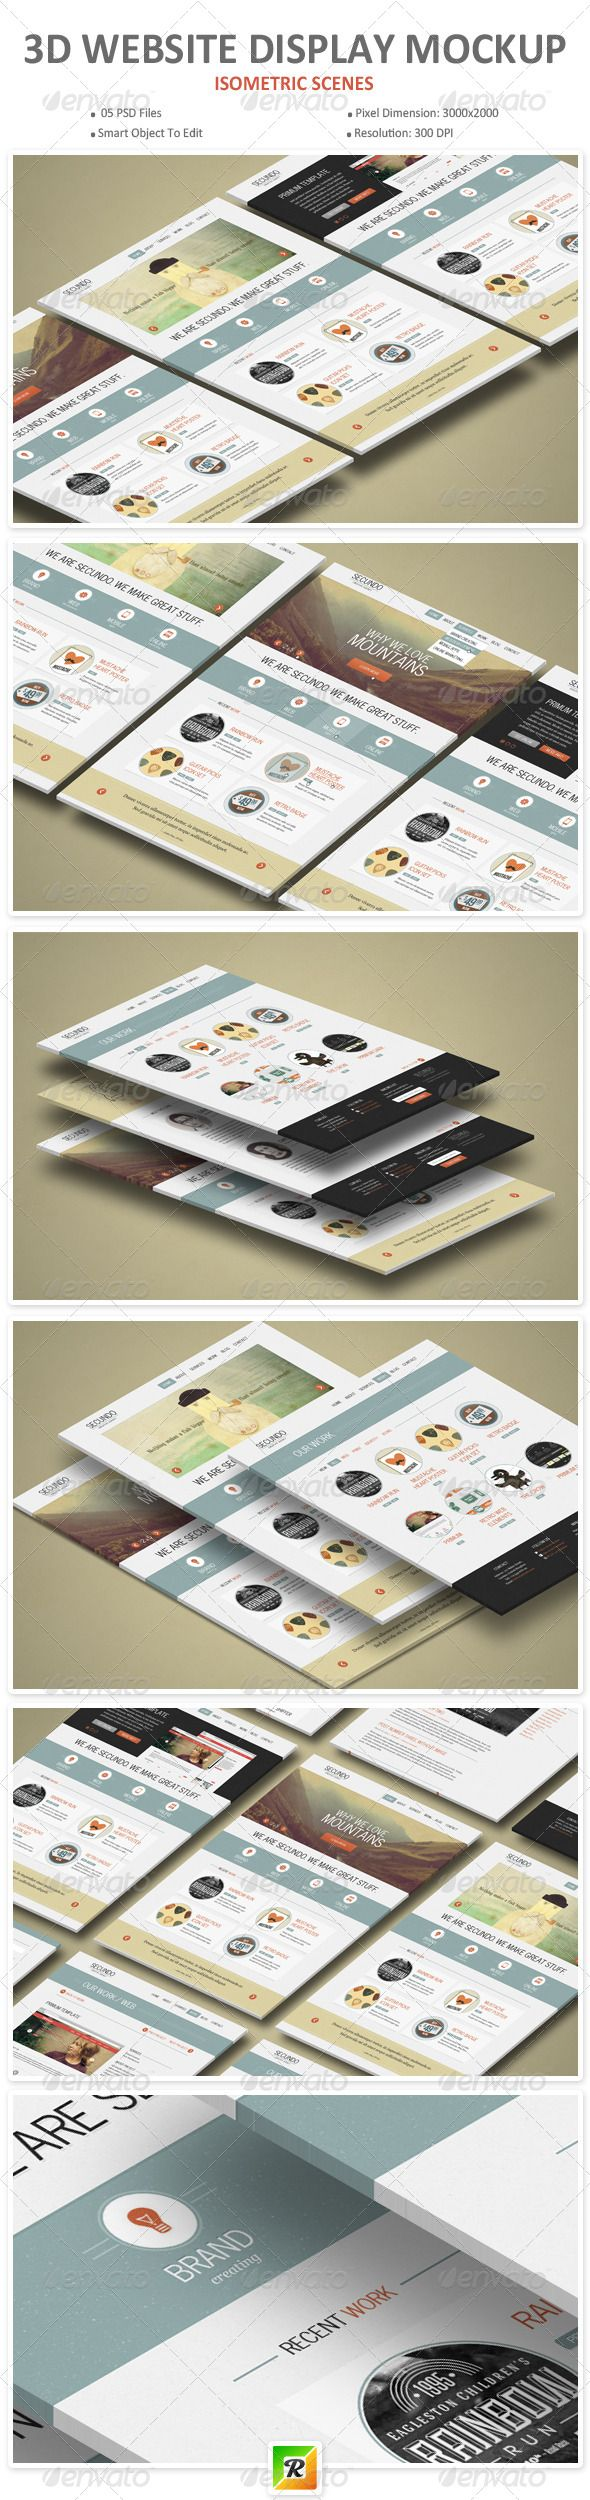 3d Website Display Mockup 3d mockup, a4 paper, app design, application, clean, display mockup, gui, gui mockup, ios, iphone, mobile display, photoshop, presentation, responsive, showcase, web design, web template, webe theme, webpage, website, 3d Website Display Mockup